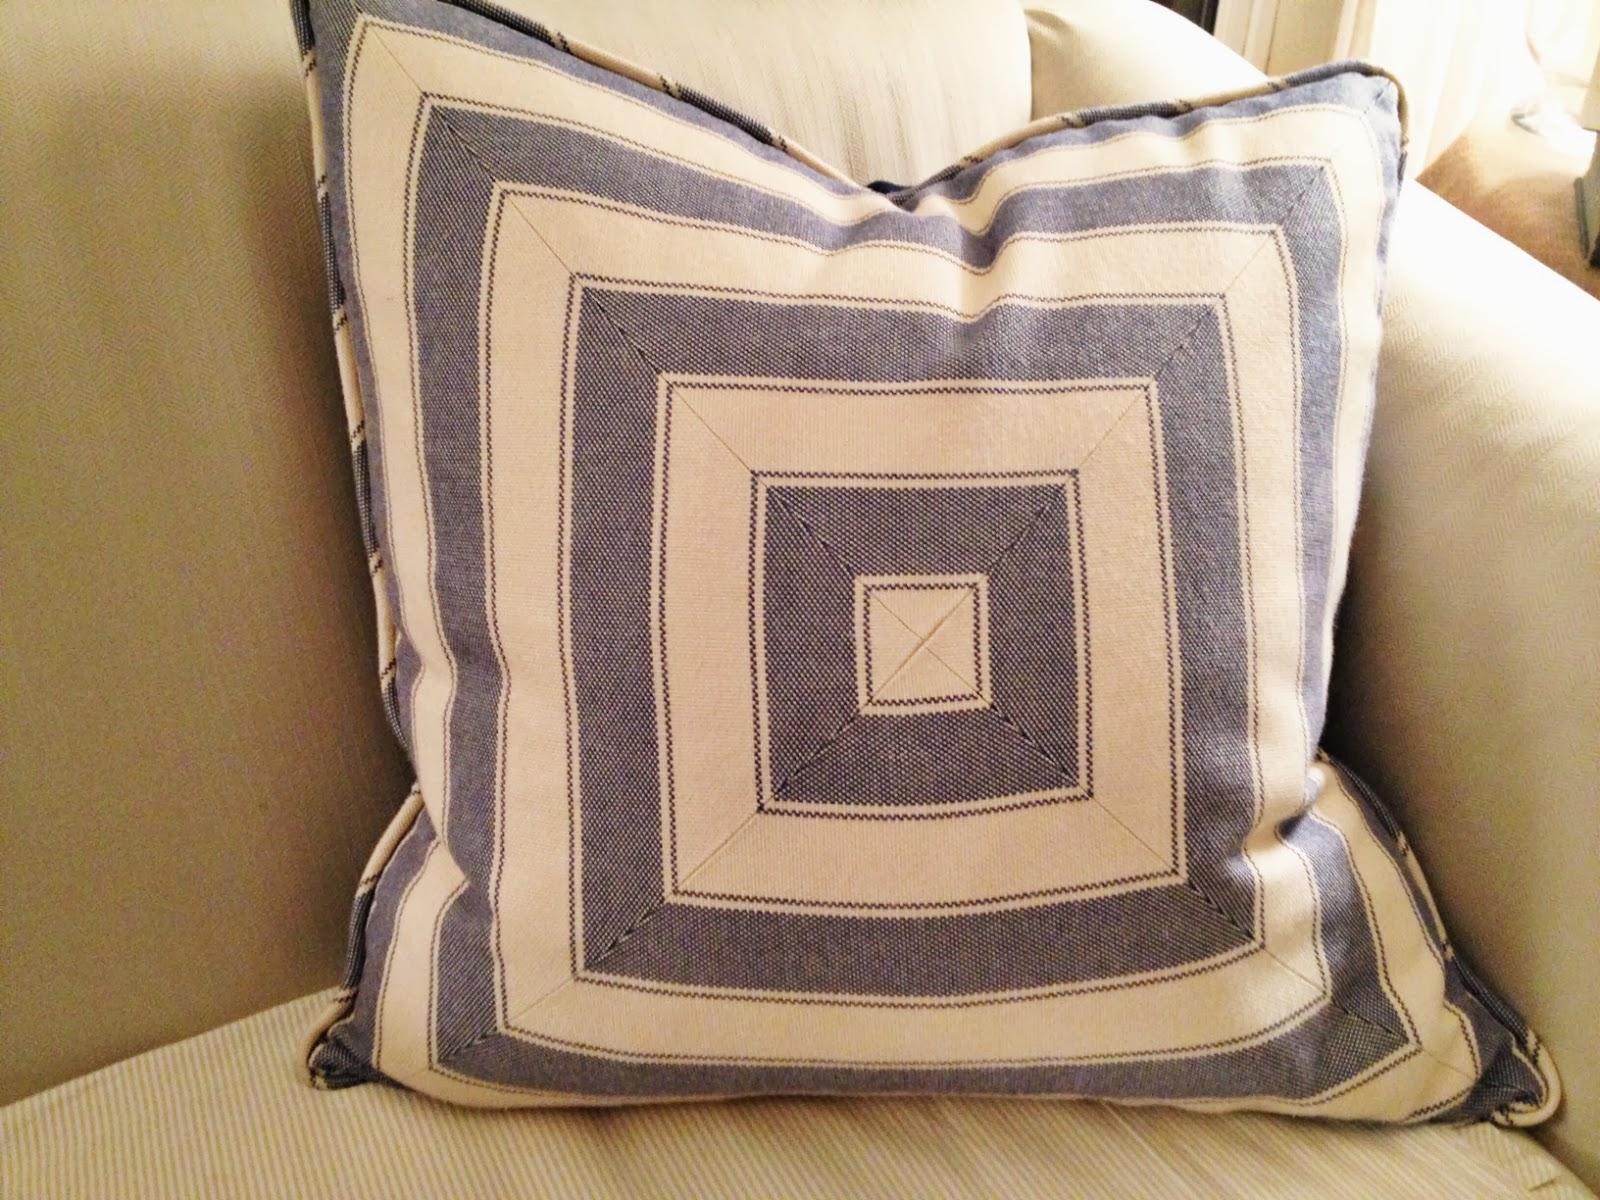 How To Make Decorative Pillows With Cording : Gracious Farmhouse: DIY Cording for Throw Pillows